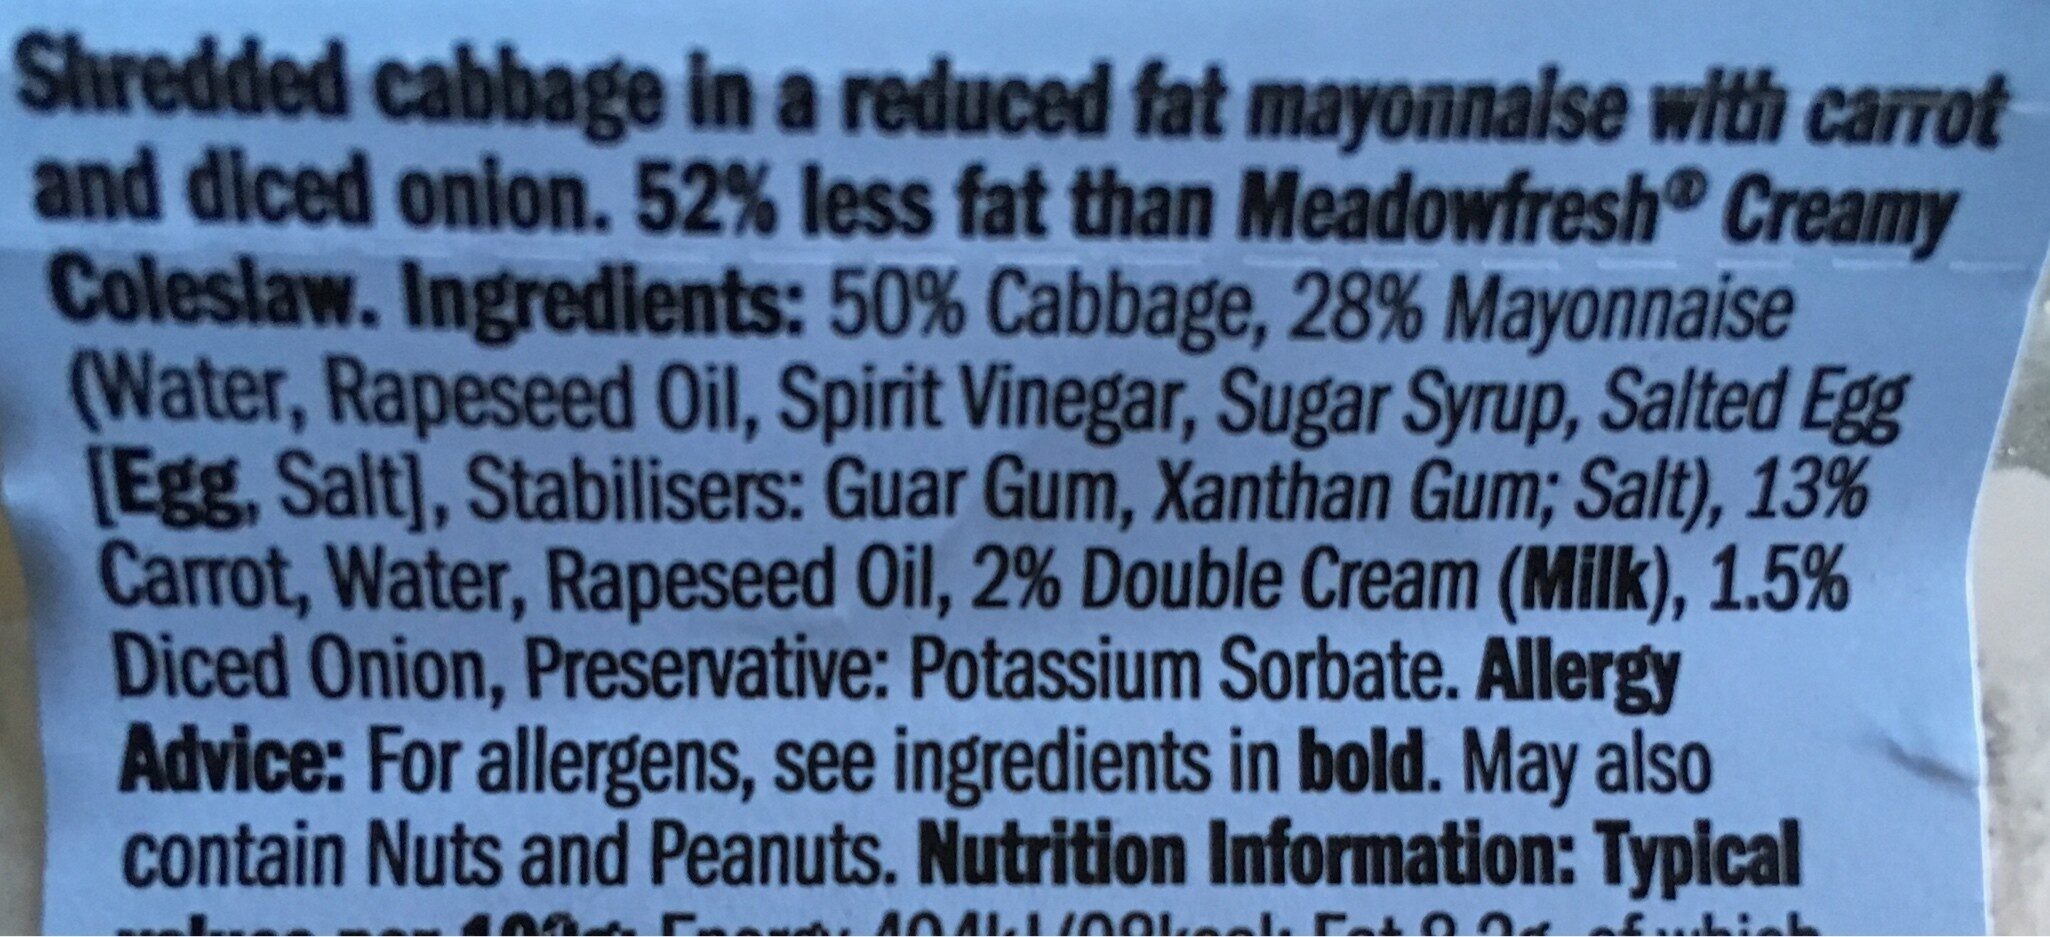 Reduced Fat Coleslaw - Ingredients